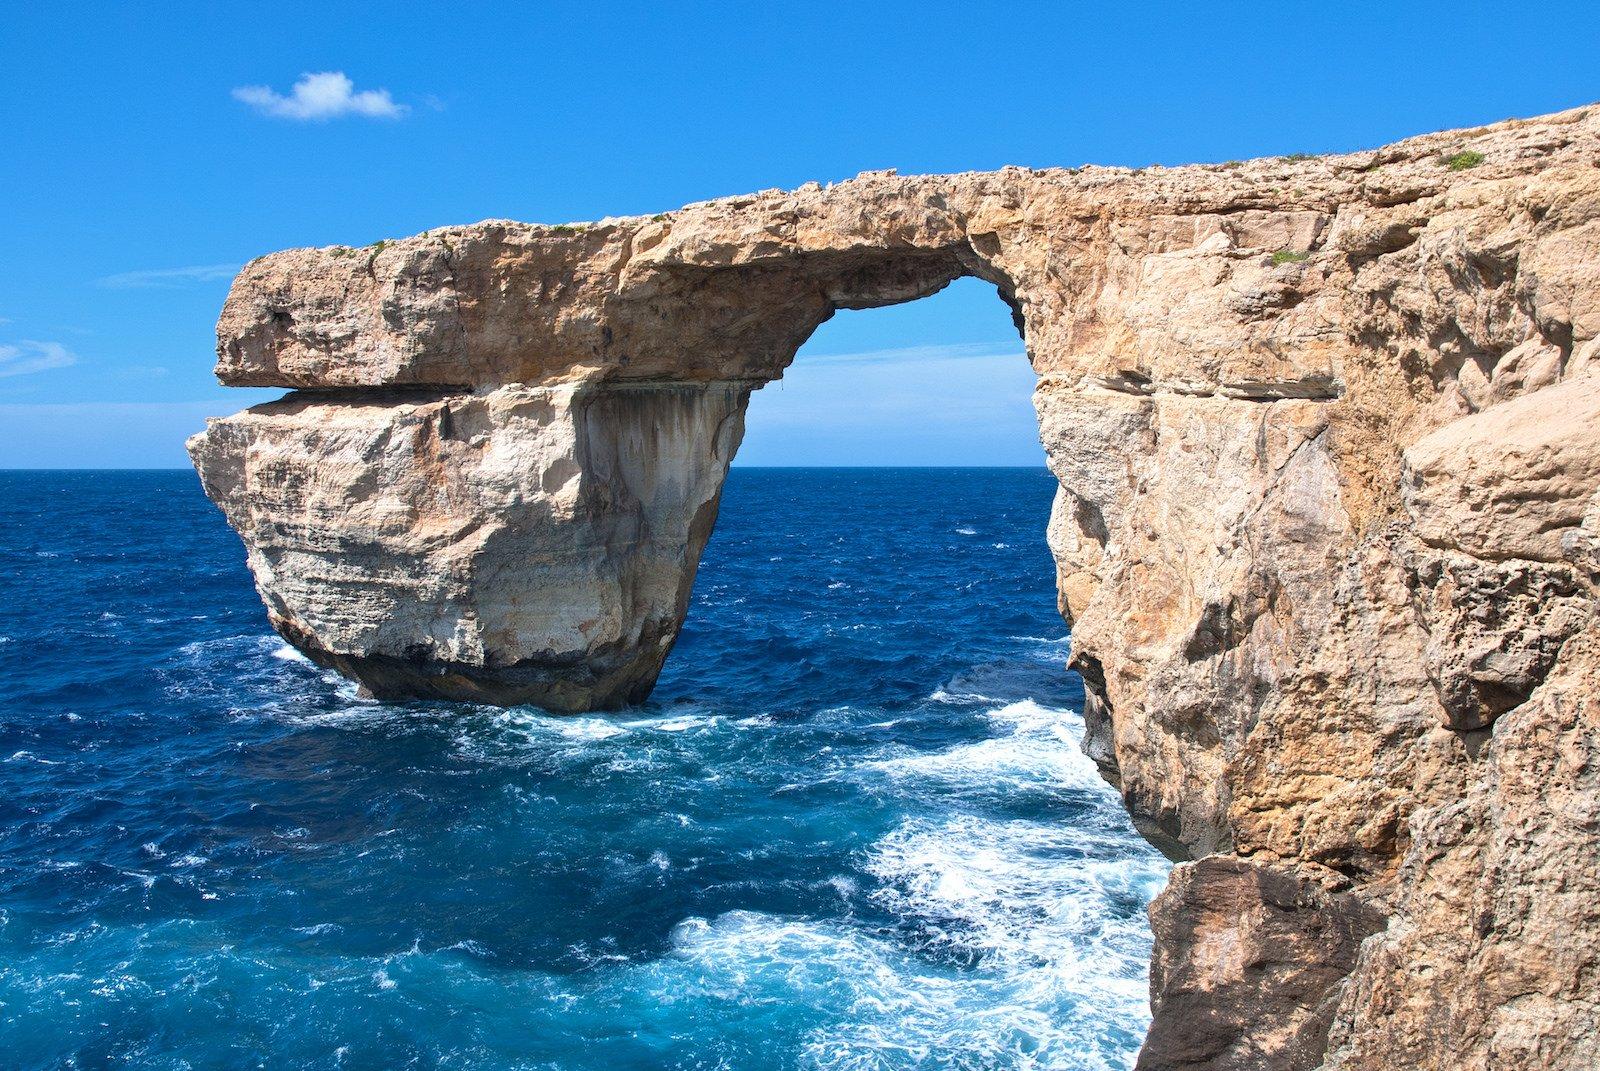 Malta's Famous Azure Window Rock Arch Collapses, Photographers Mourn